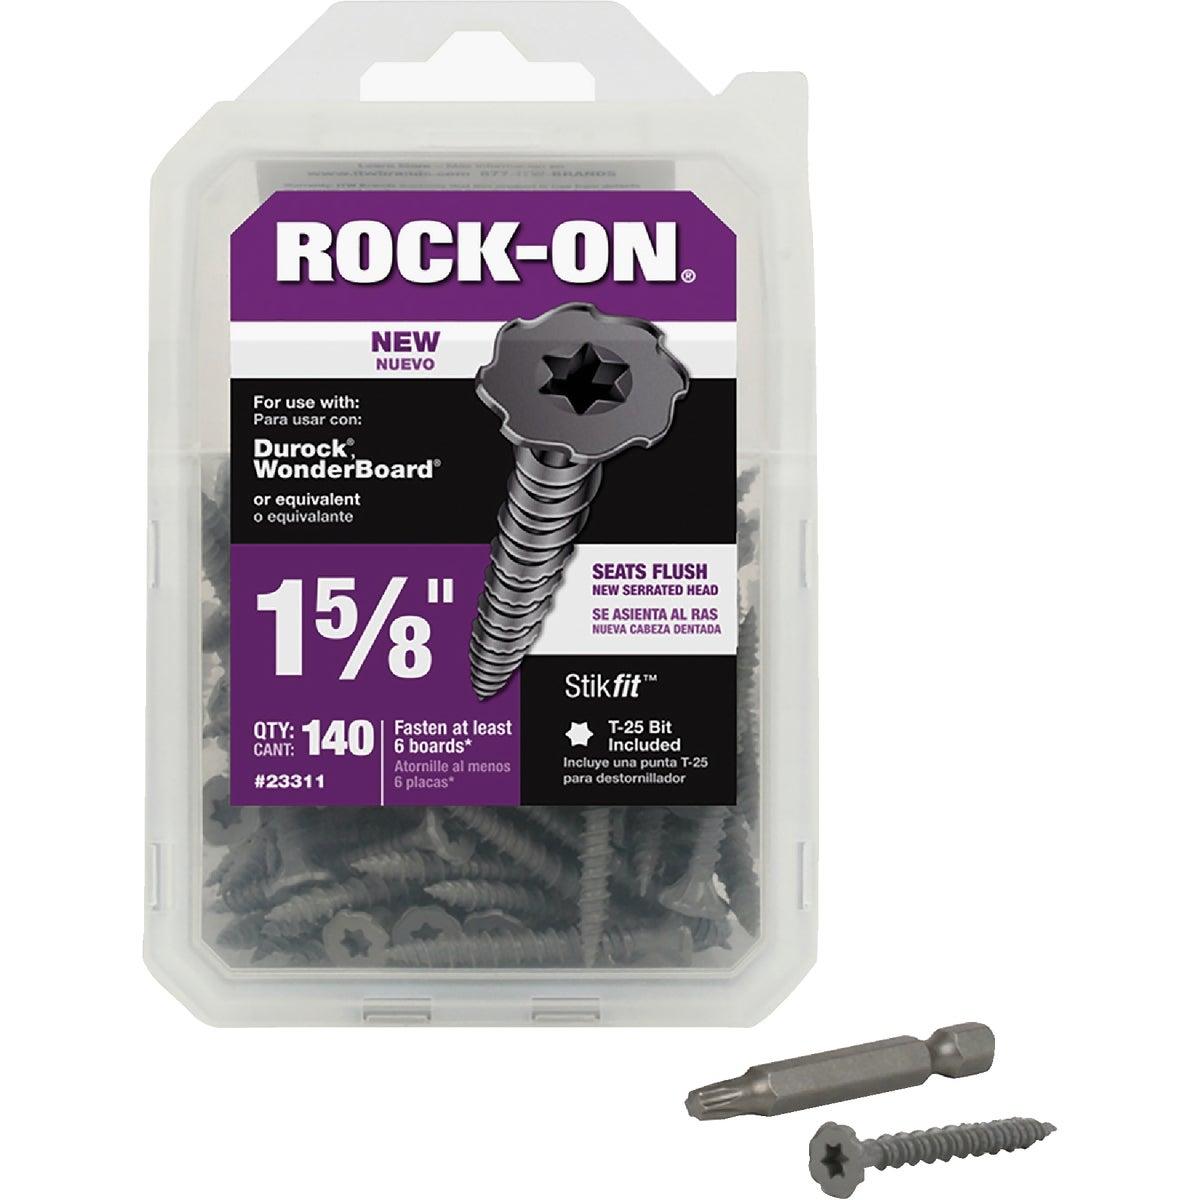 150 9X1-5/8 ROCK-ON HILO